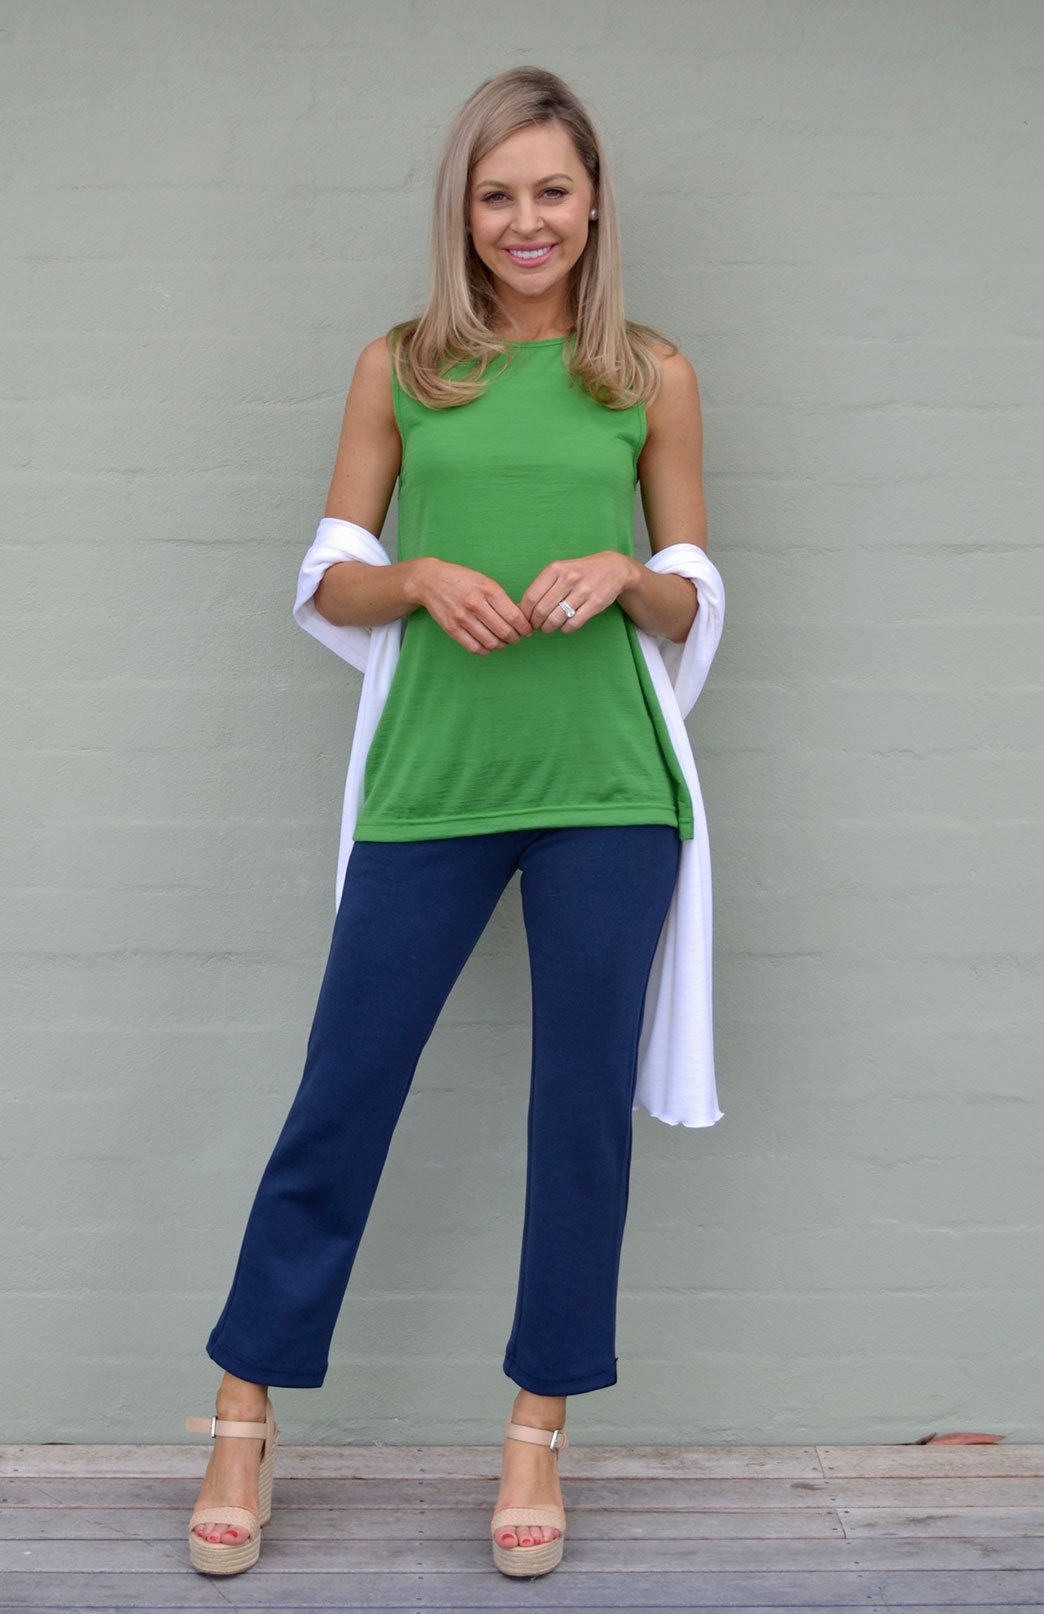 Capri Pants - Heavyweight - Women's Indigo Blue Ponte Merino Wool 7/8th Crop Pants - Smitten Merino Tasmania Australia